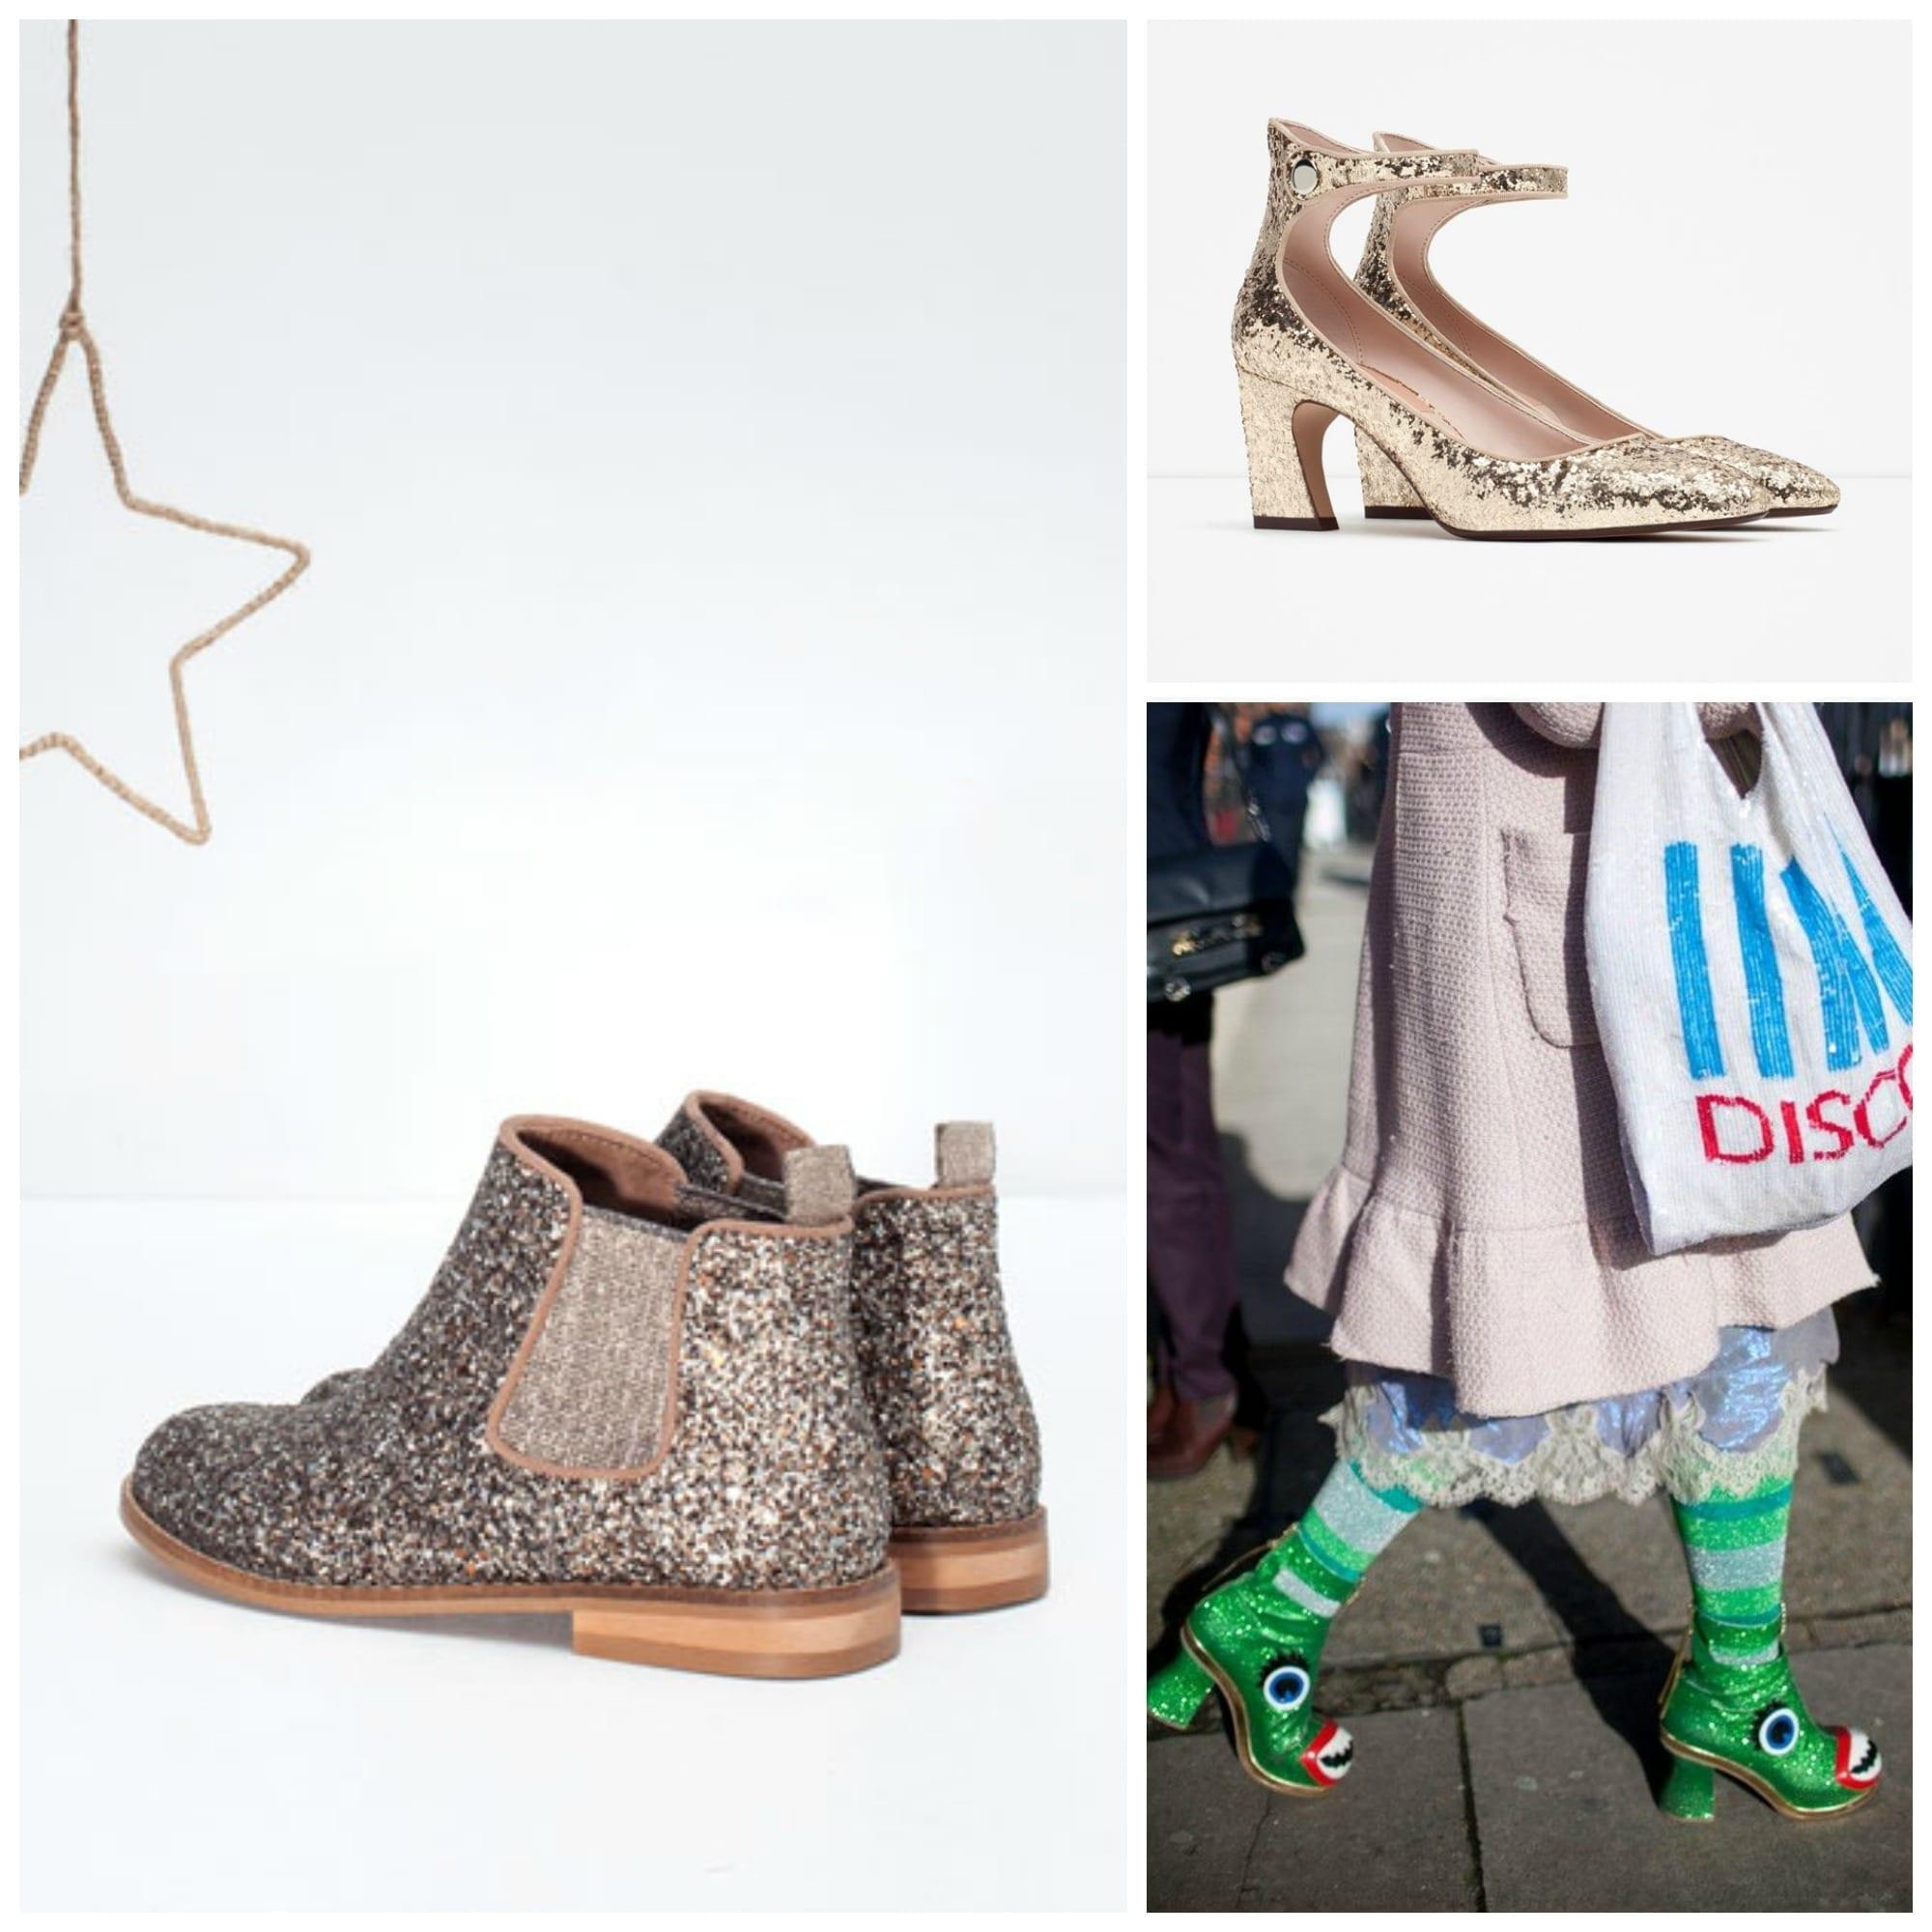 che scarpe vanno di moda, sophia webster shoes, rockstud valentino, glitter scarpe, theladycracy.it, elisa bellino, fashion blog italiane, fashion blog italia, glitter shoes zara, stivaletti zara glitter